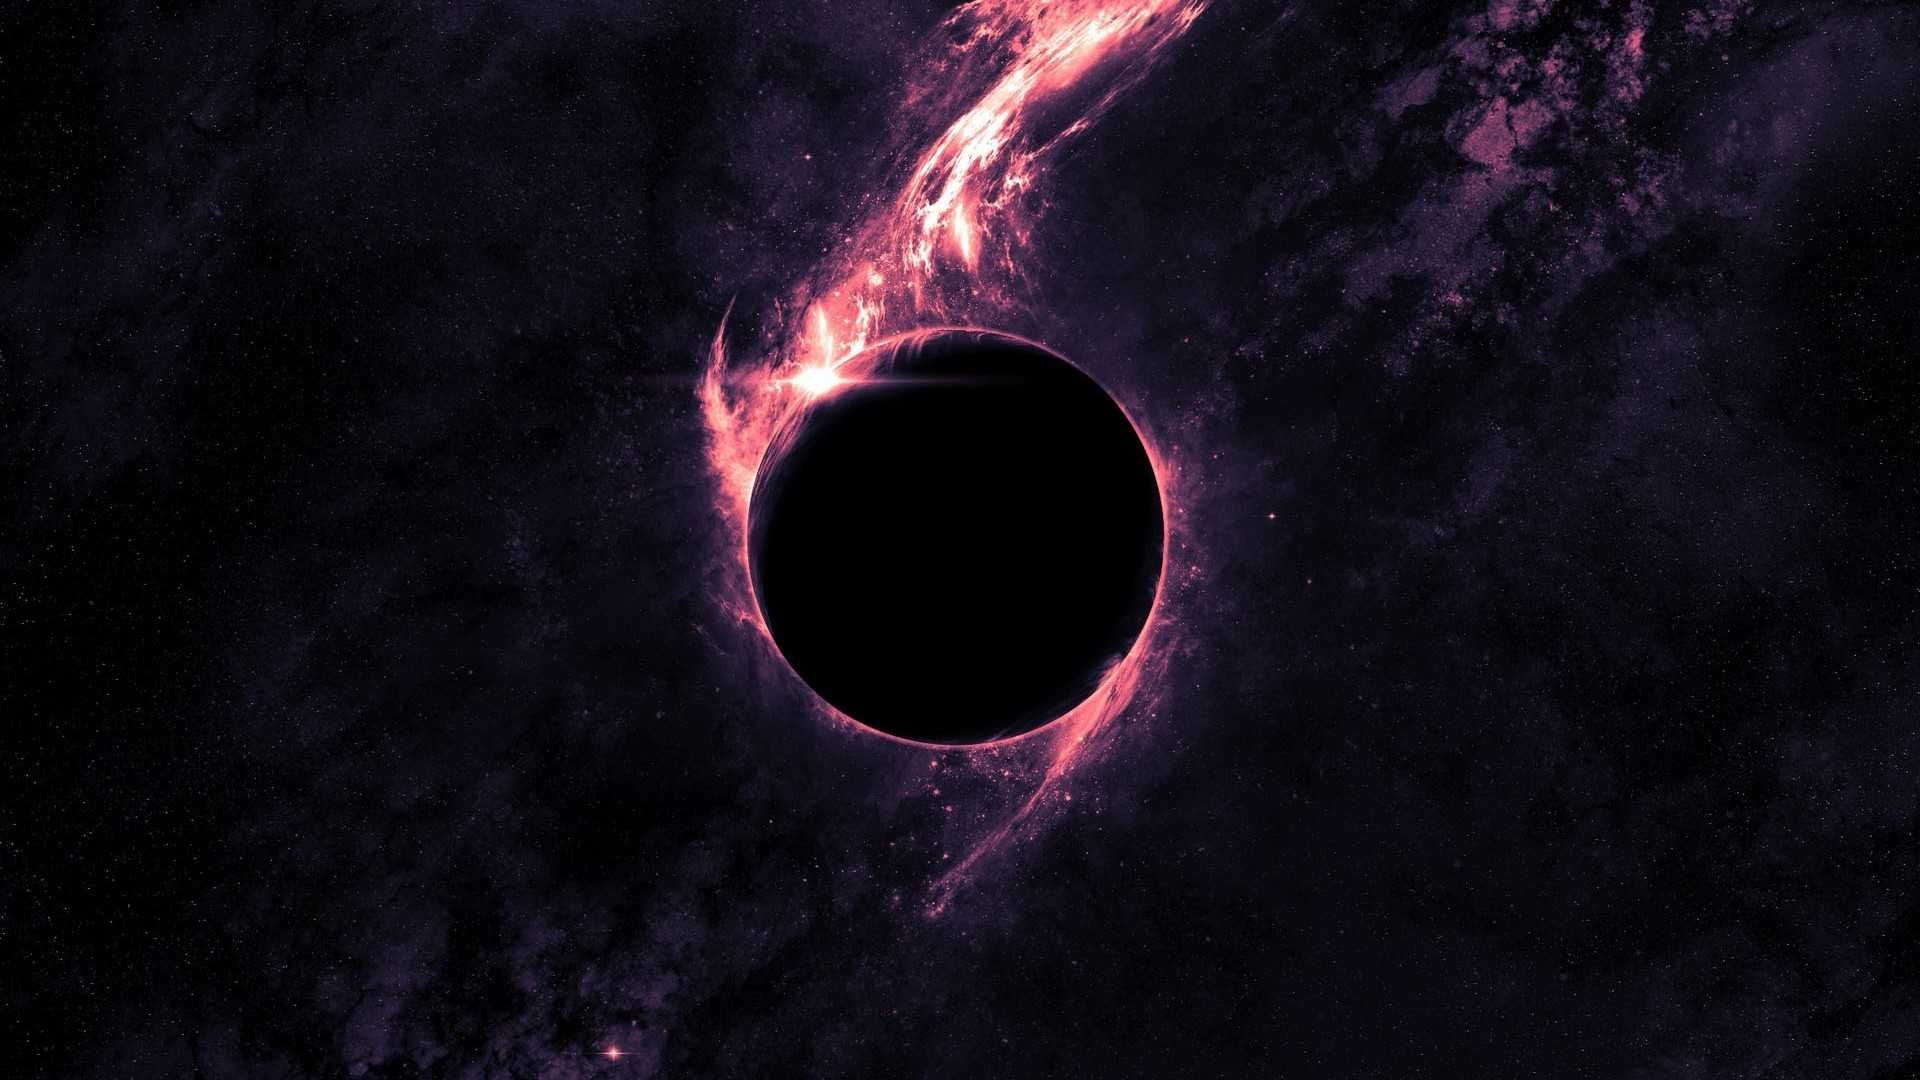 Black Hole, Wallpaper Picture